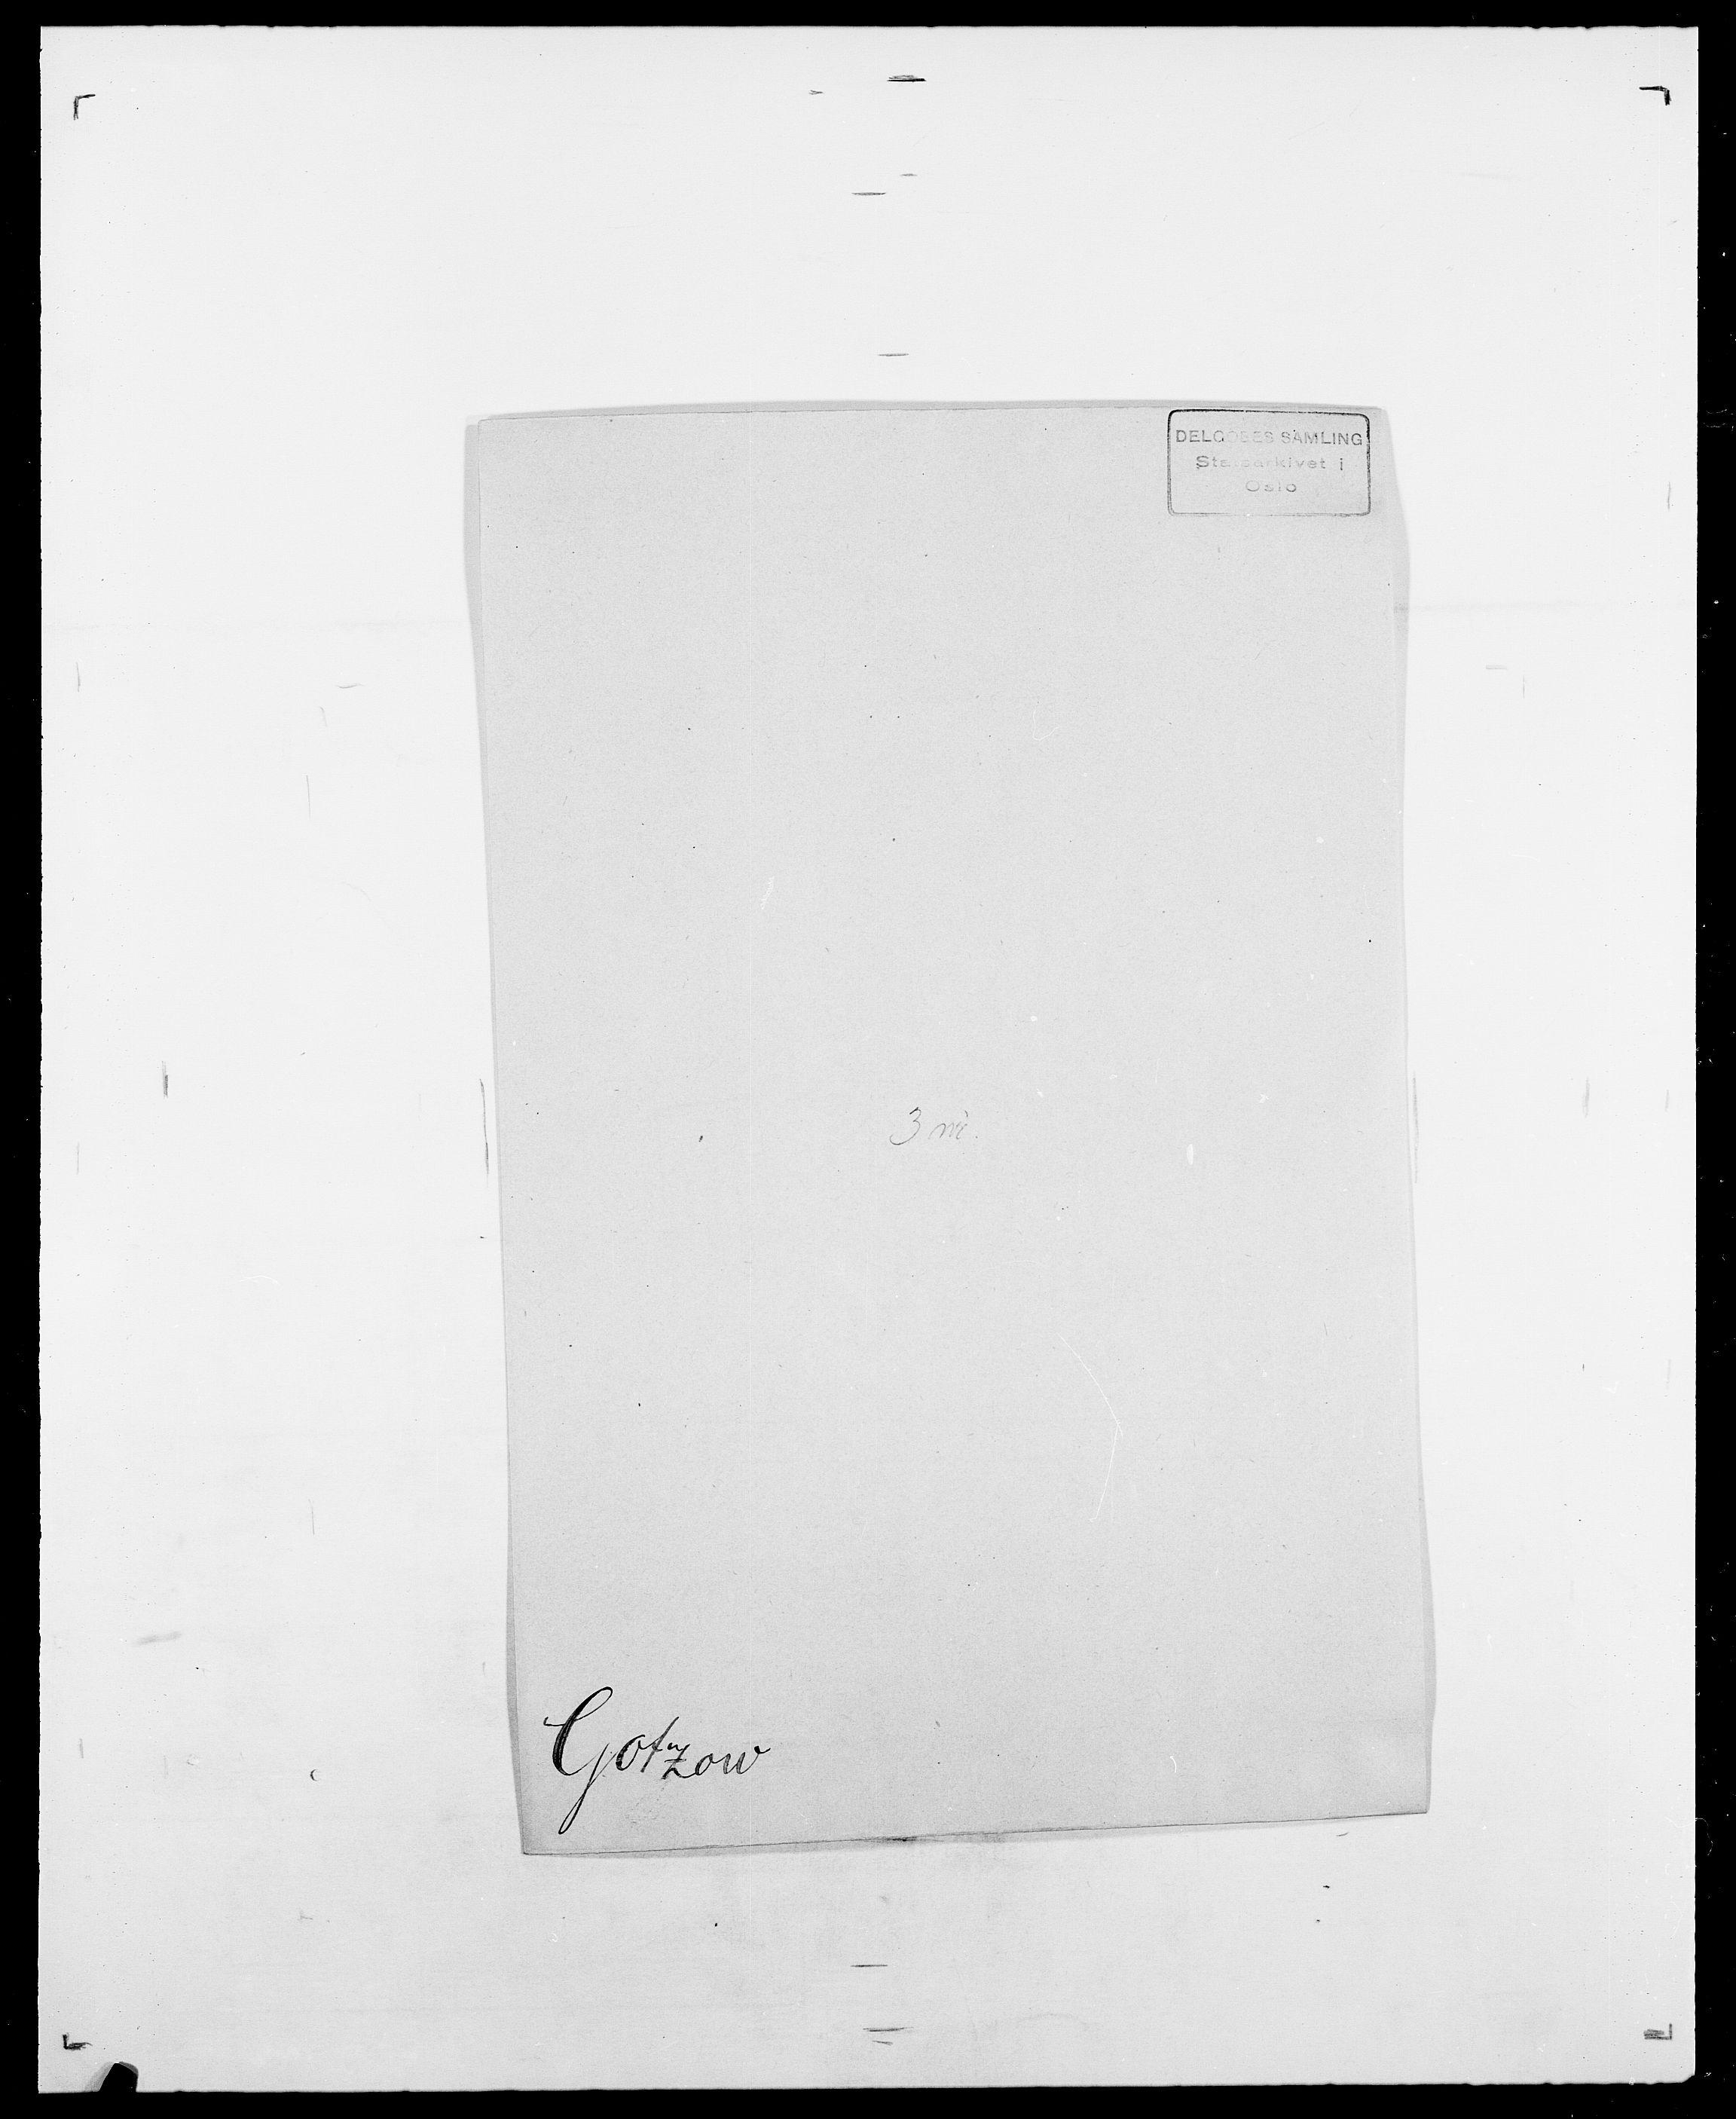 SAO, Delgobe, Charles Antoine - samling, D/Da/L0014: Giebdhausen - Grip, s. 414